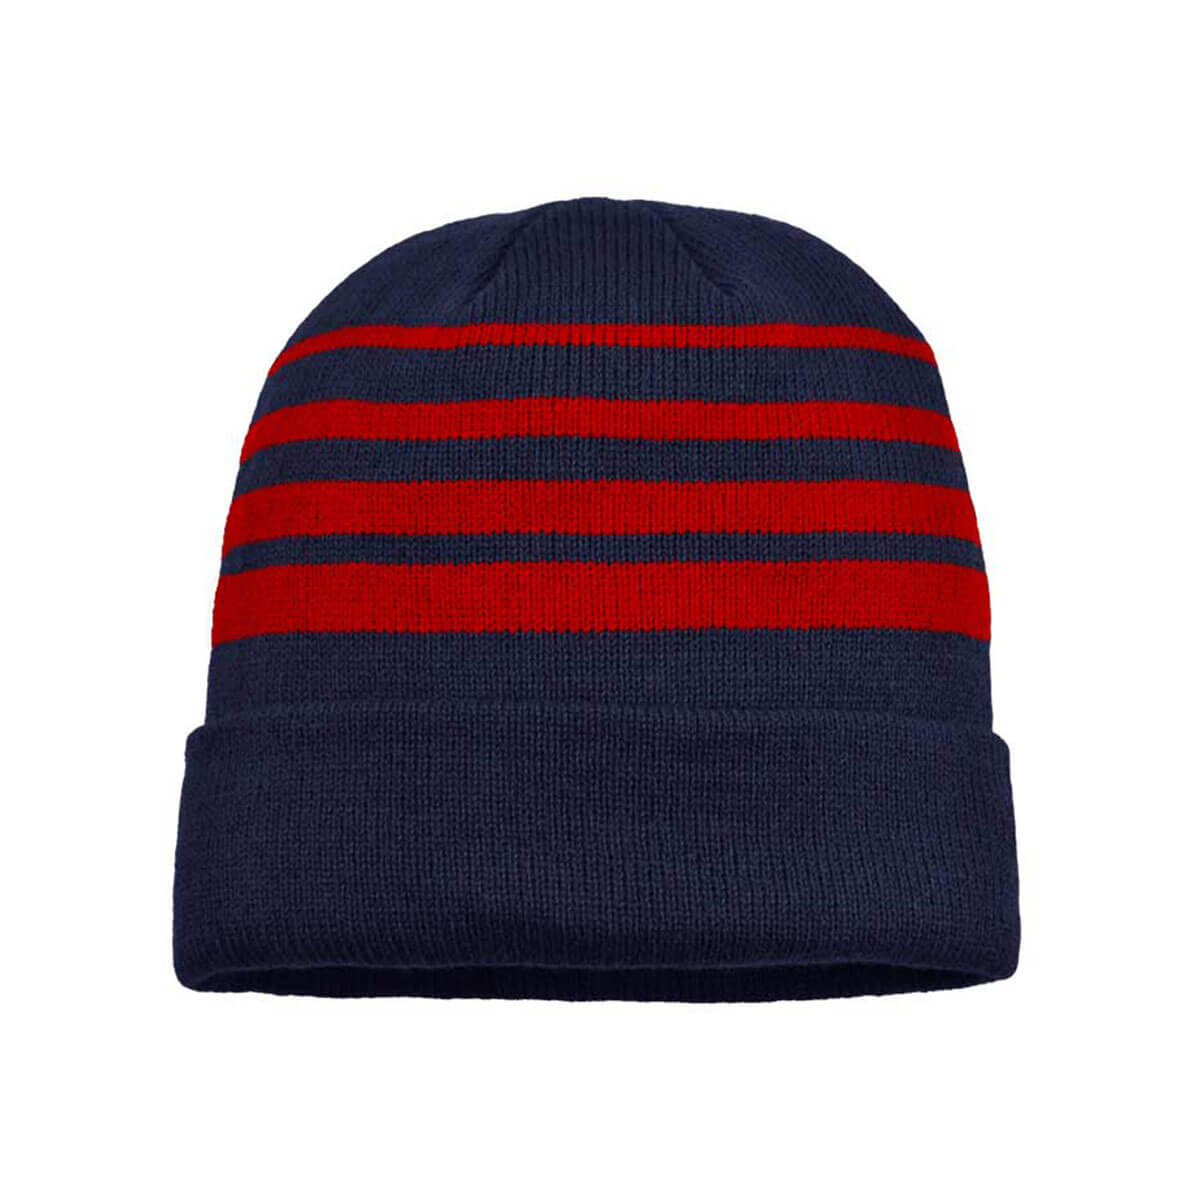 Acrylic Beanie-Navy / Red